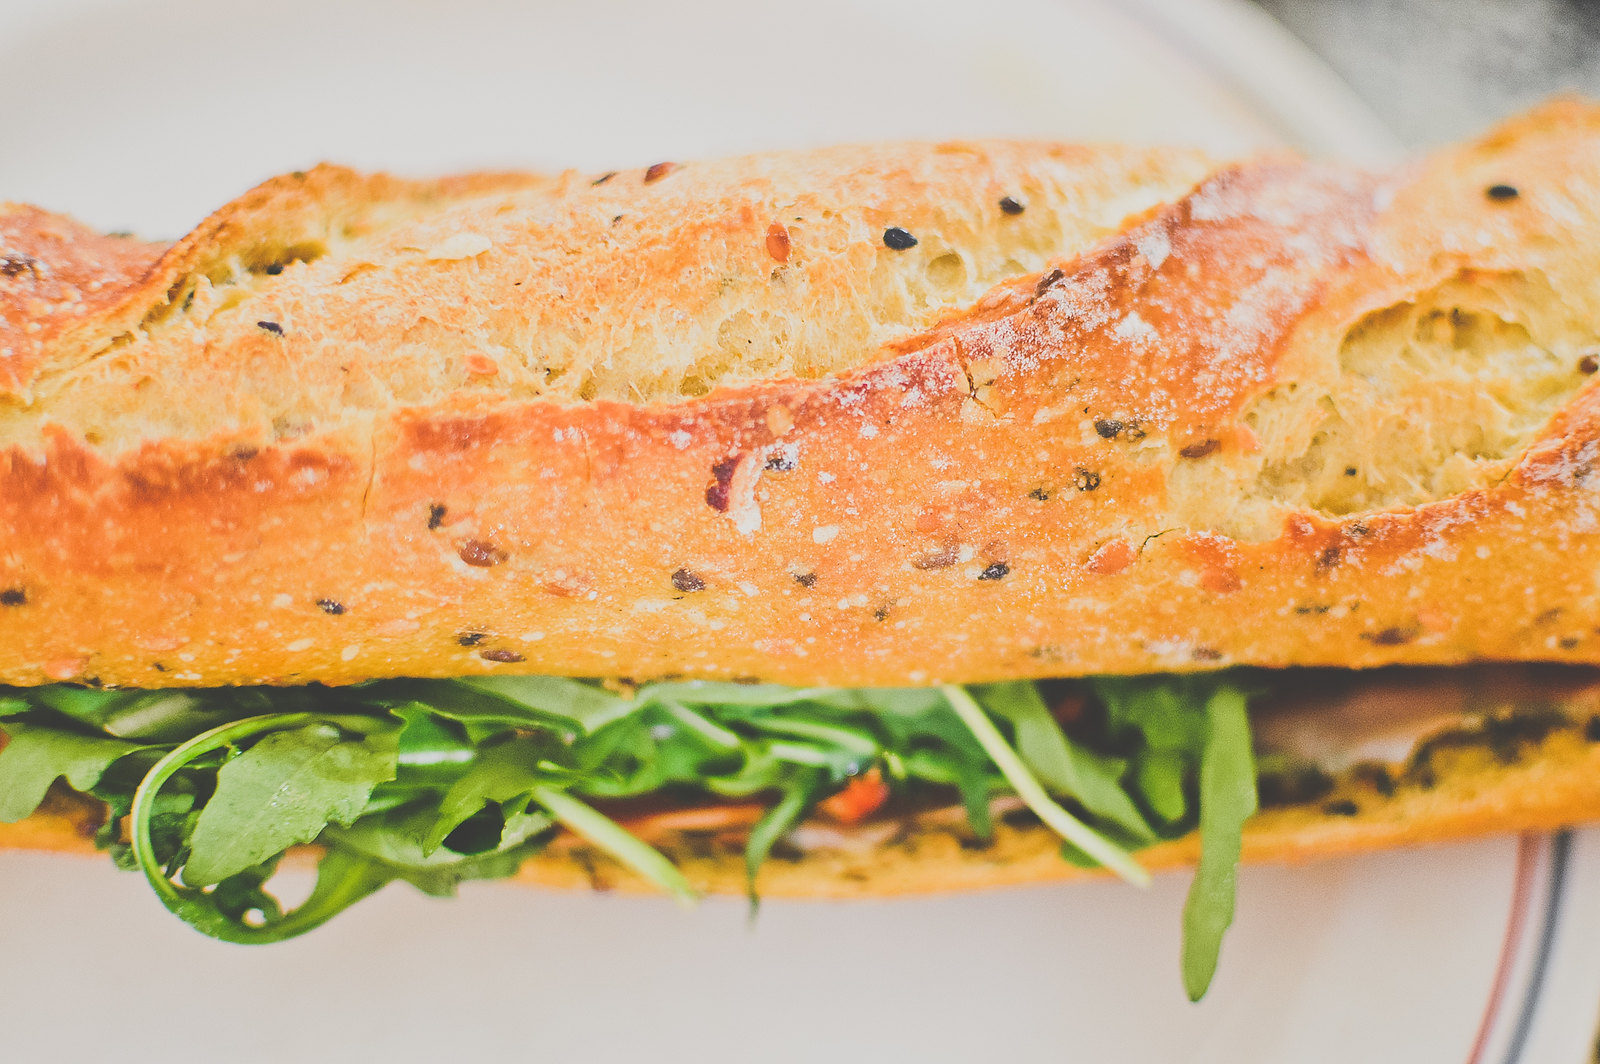 Tiong Bahru Bakery Prosciutto Rocket Sandwich